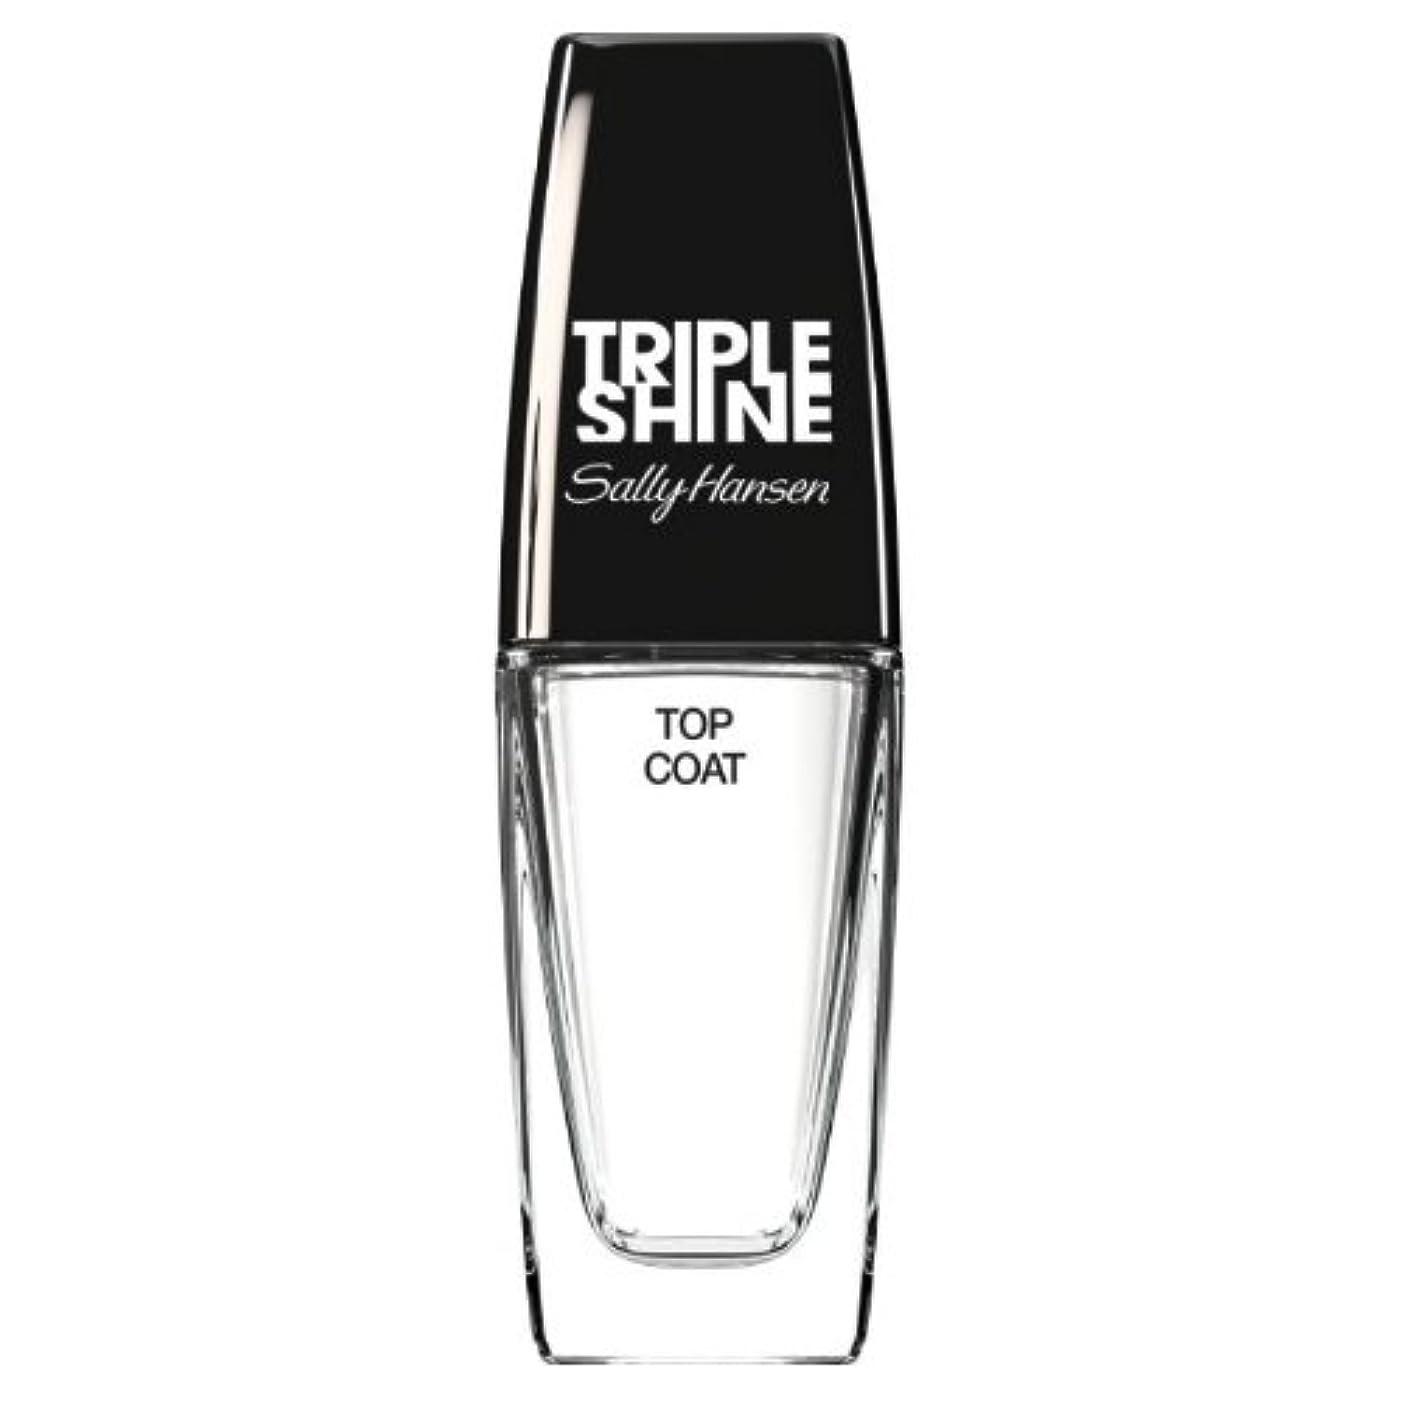 (6 Pack) SALLY HANSEN Triple Shine Top Coat - Triple Shine Top Coat (並行輸入品)